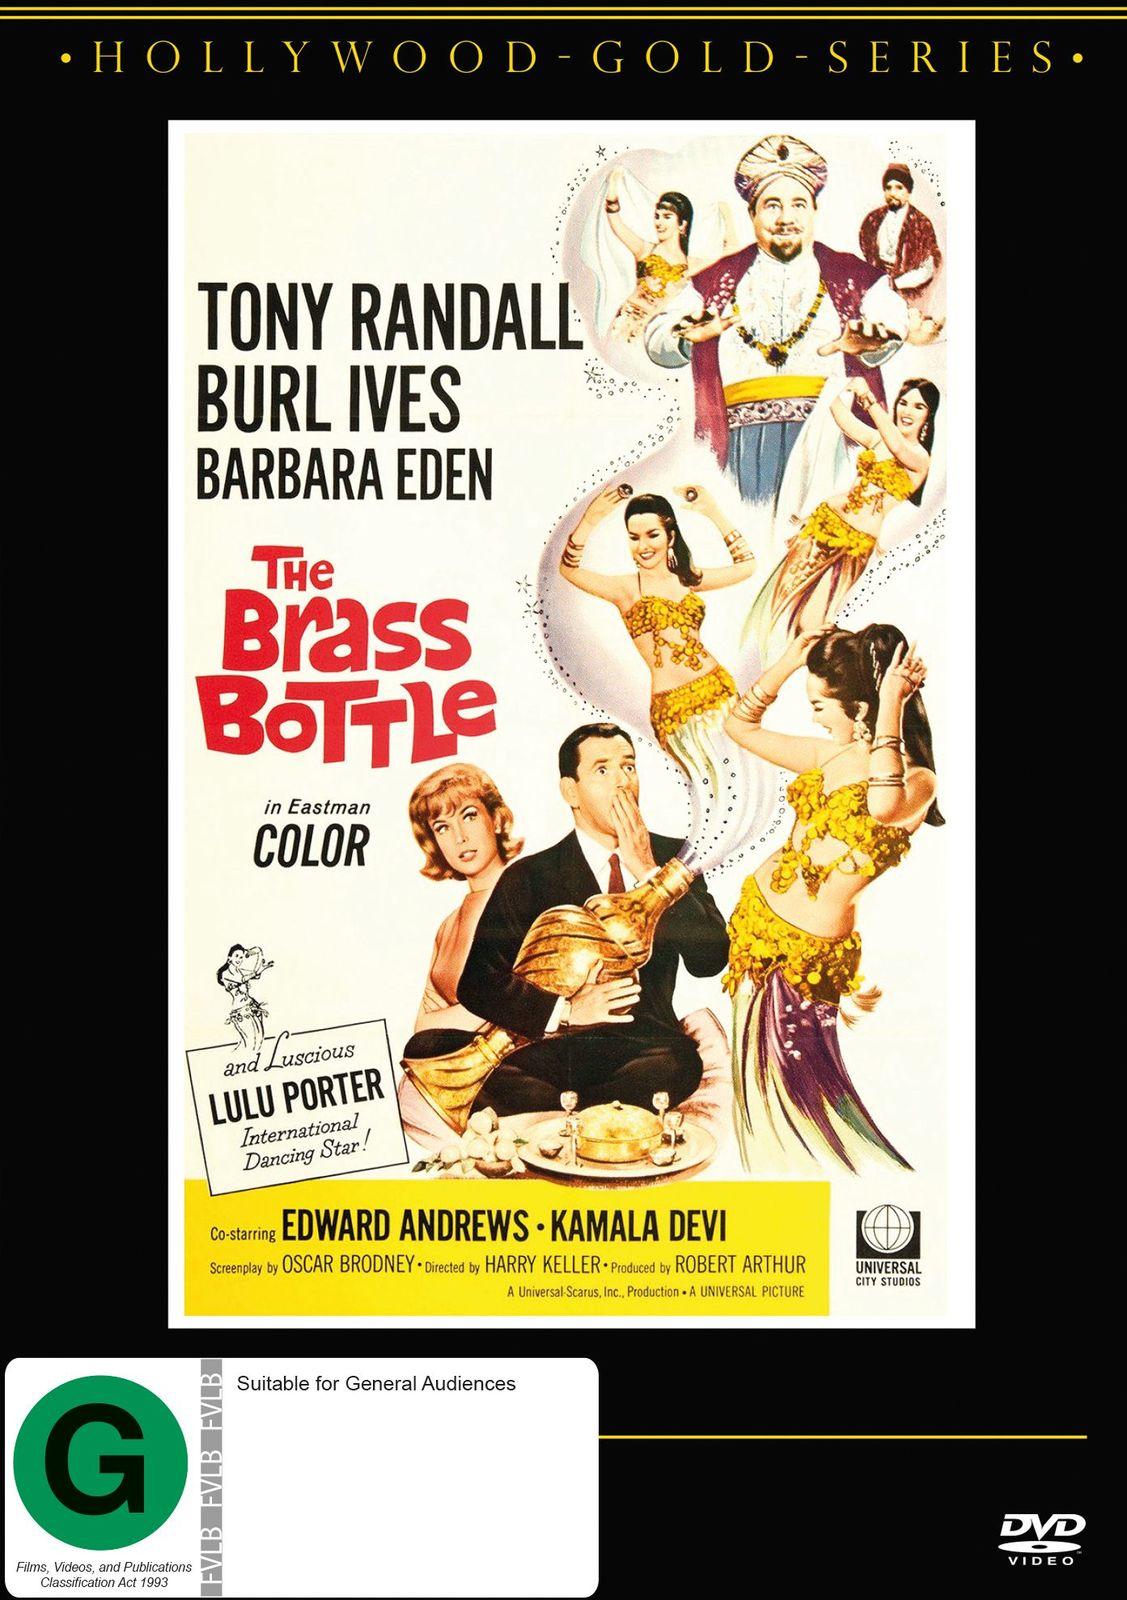 The Brass Bottle image